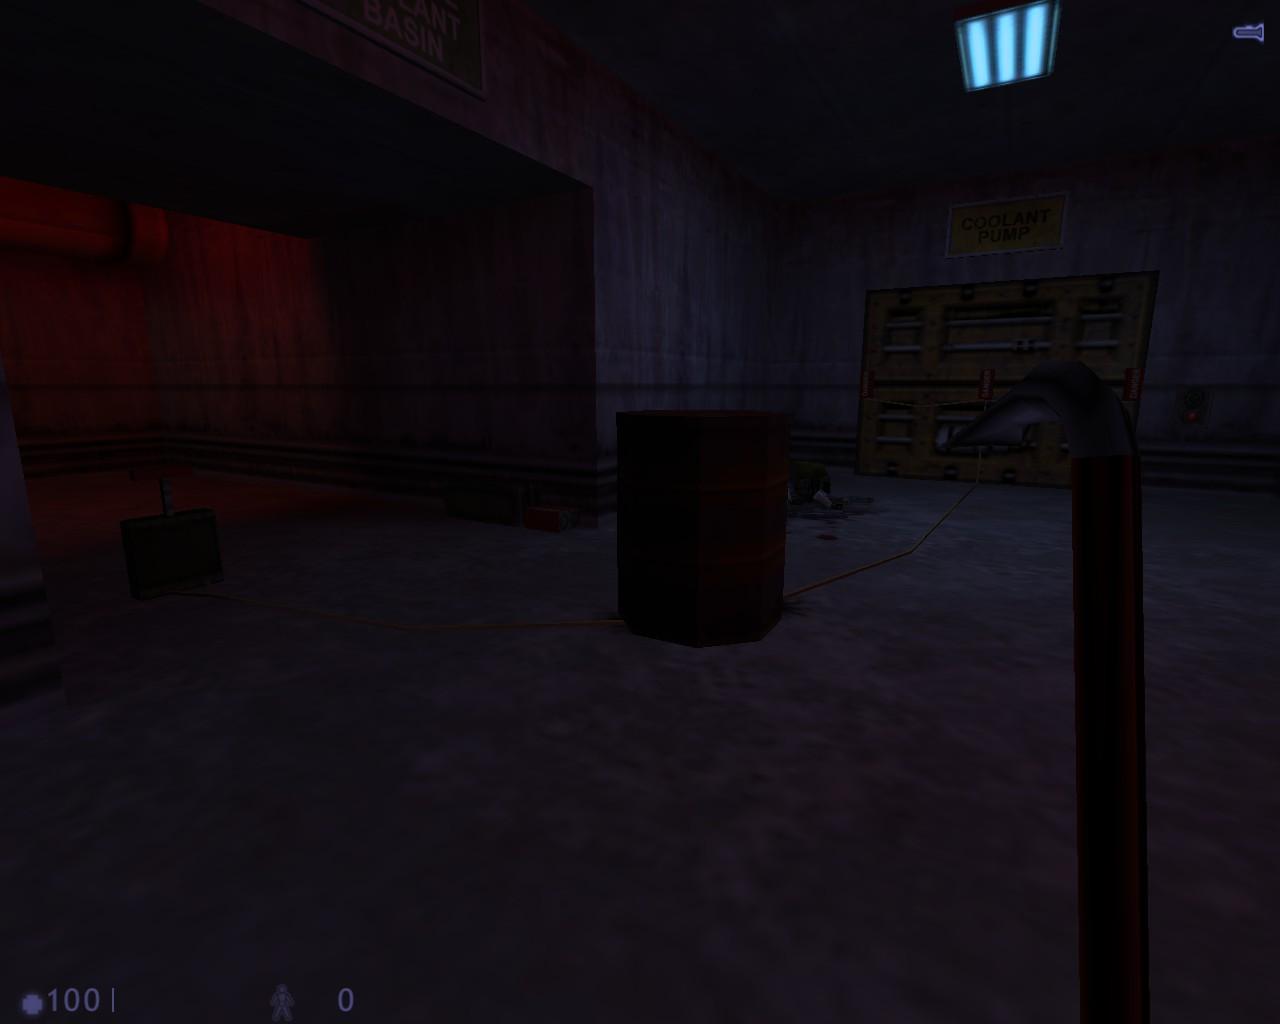 hl 2014-01-01 19-17-51-03.jpg - Half-Life